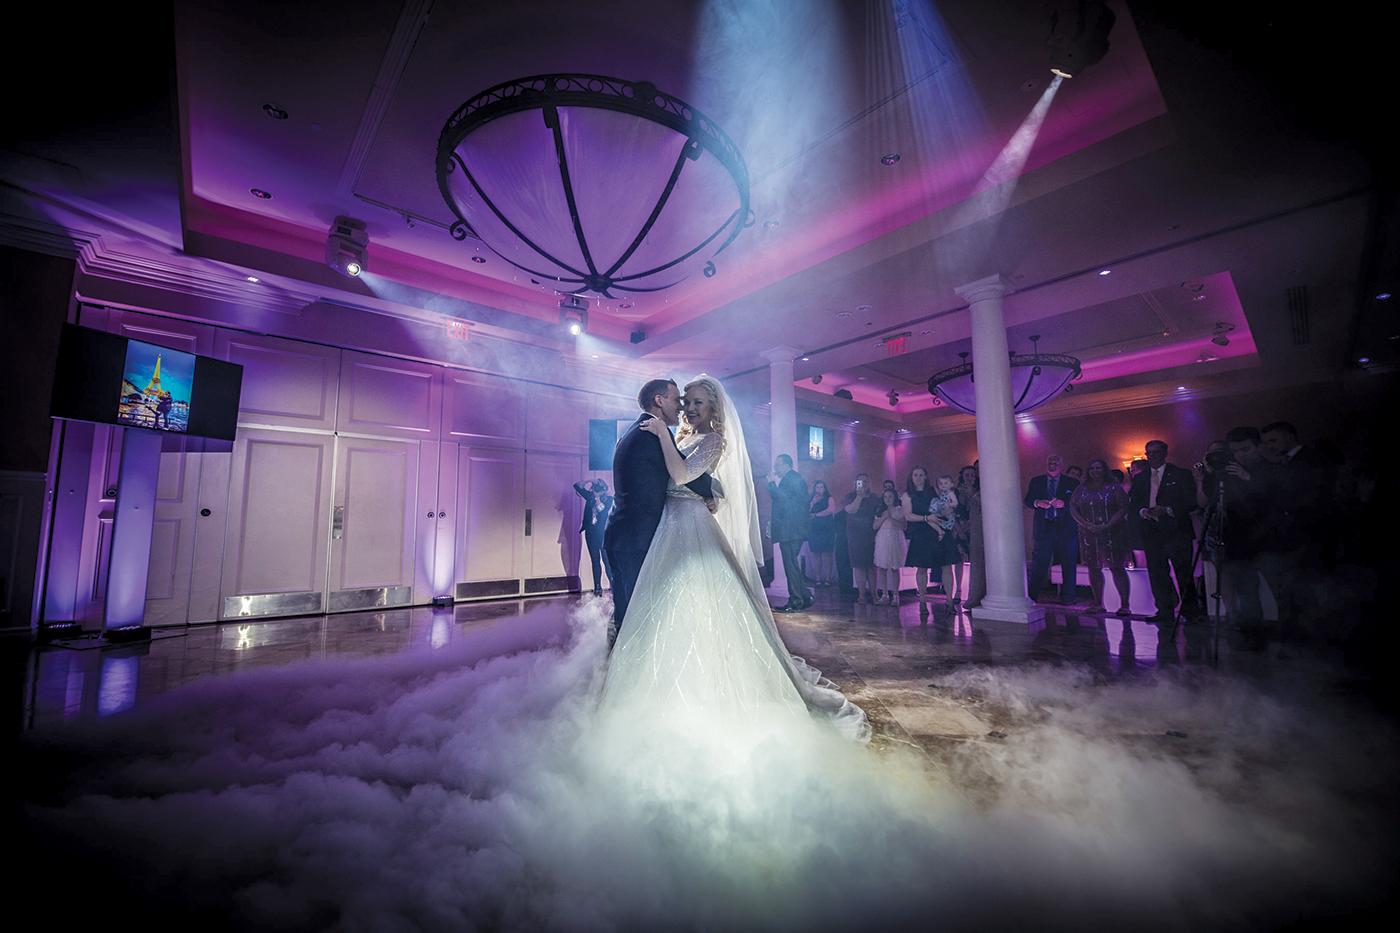 Katherine & Phillip's Wedding at The Vanderbilt at South Beach (Matt Simpkins Photography)